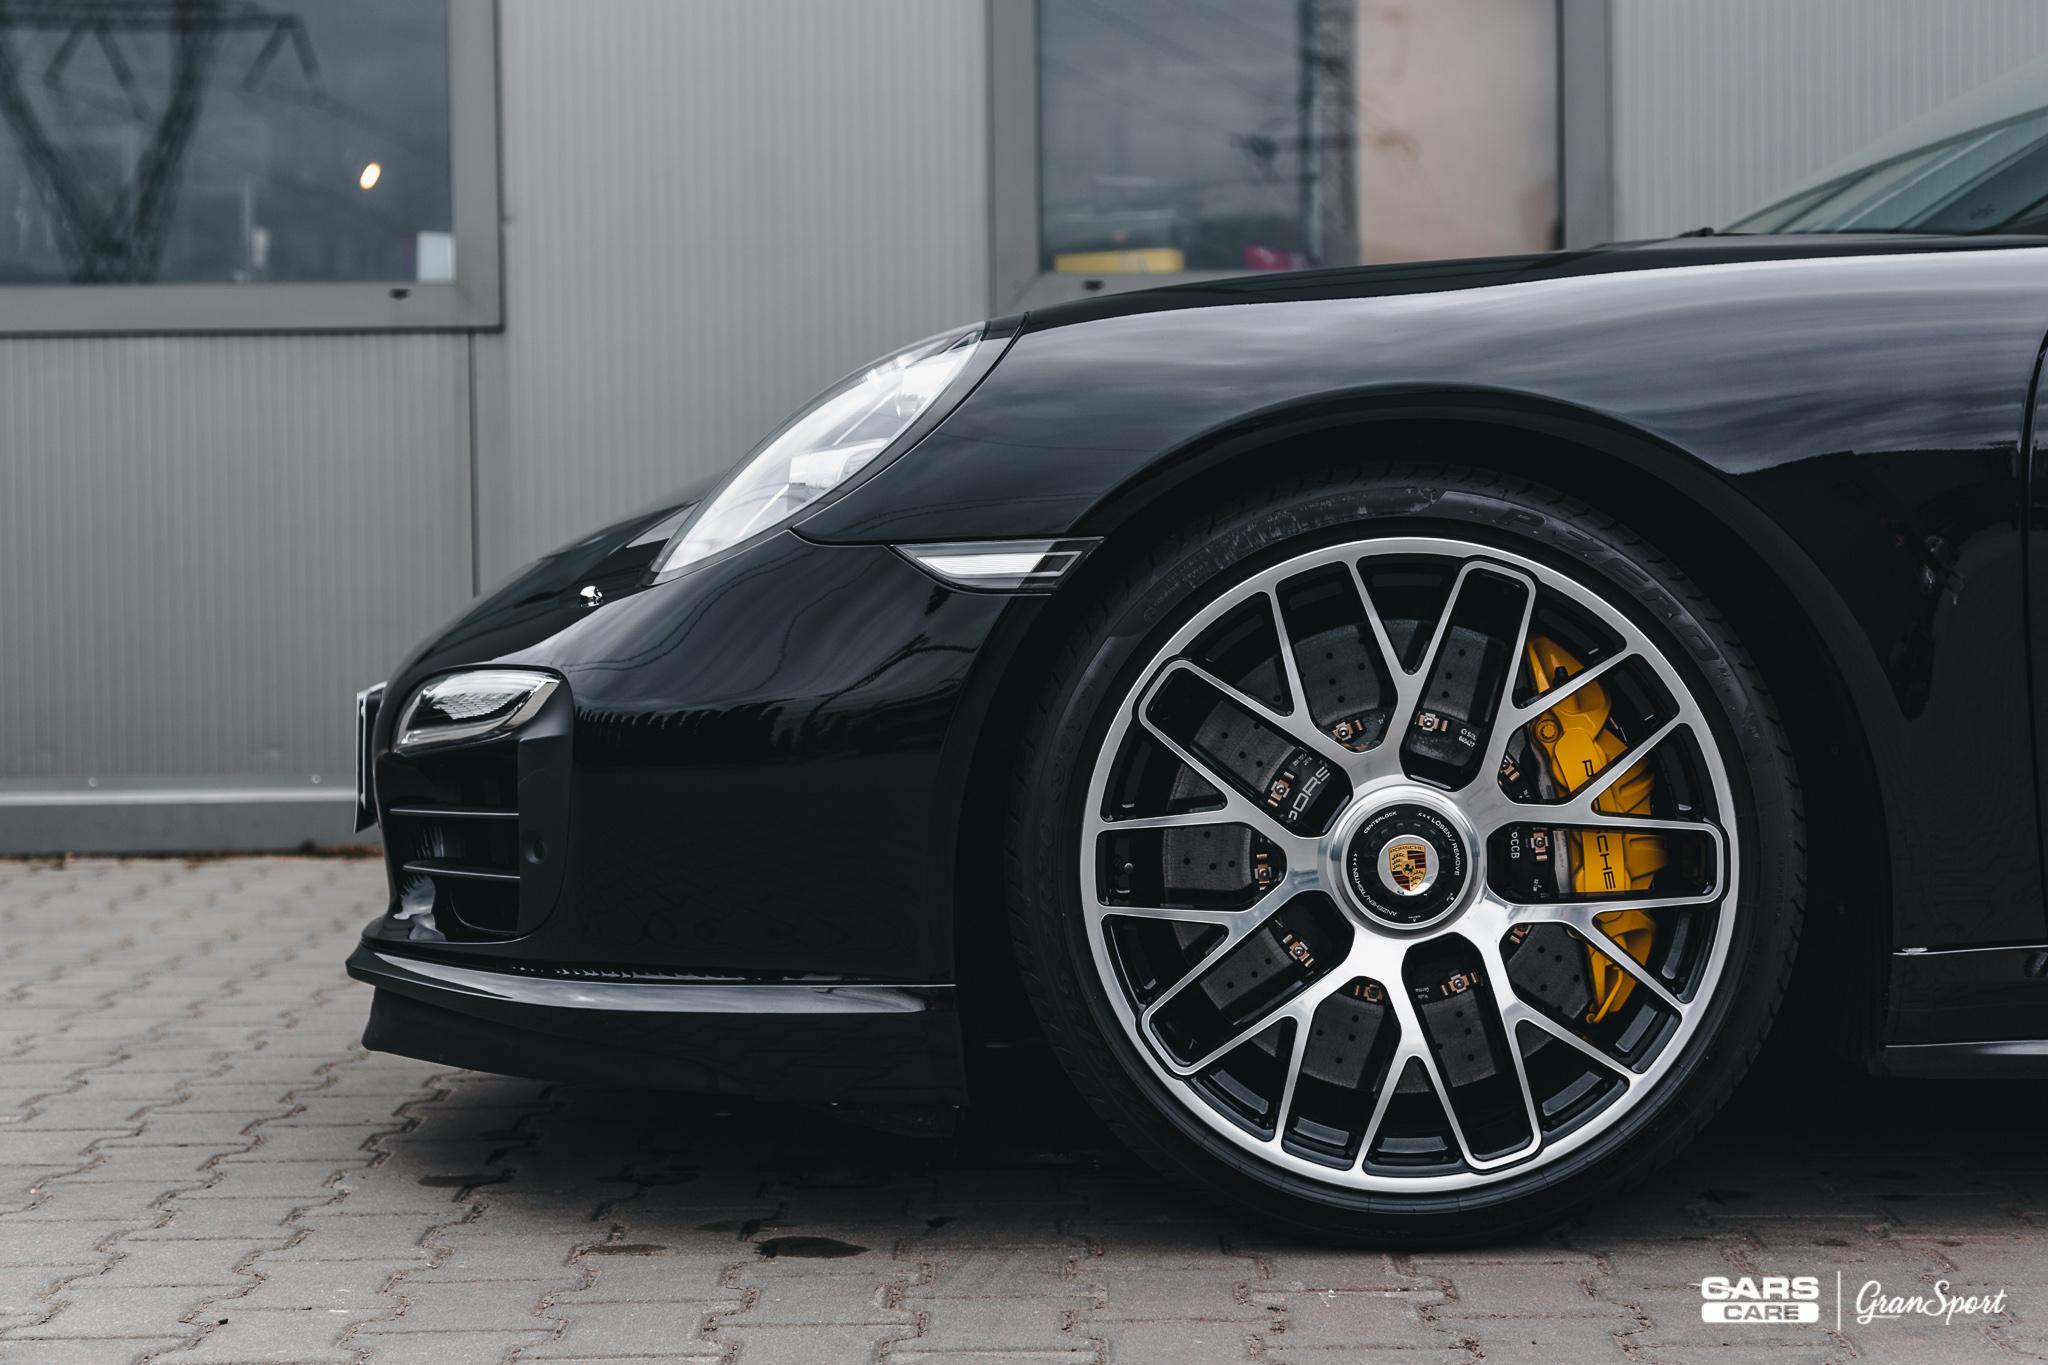 Porsche 911 Turbo S Capristo